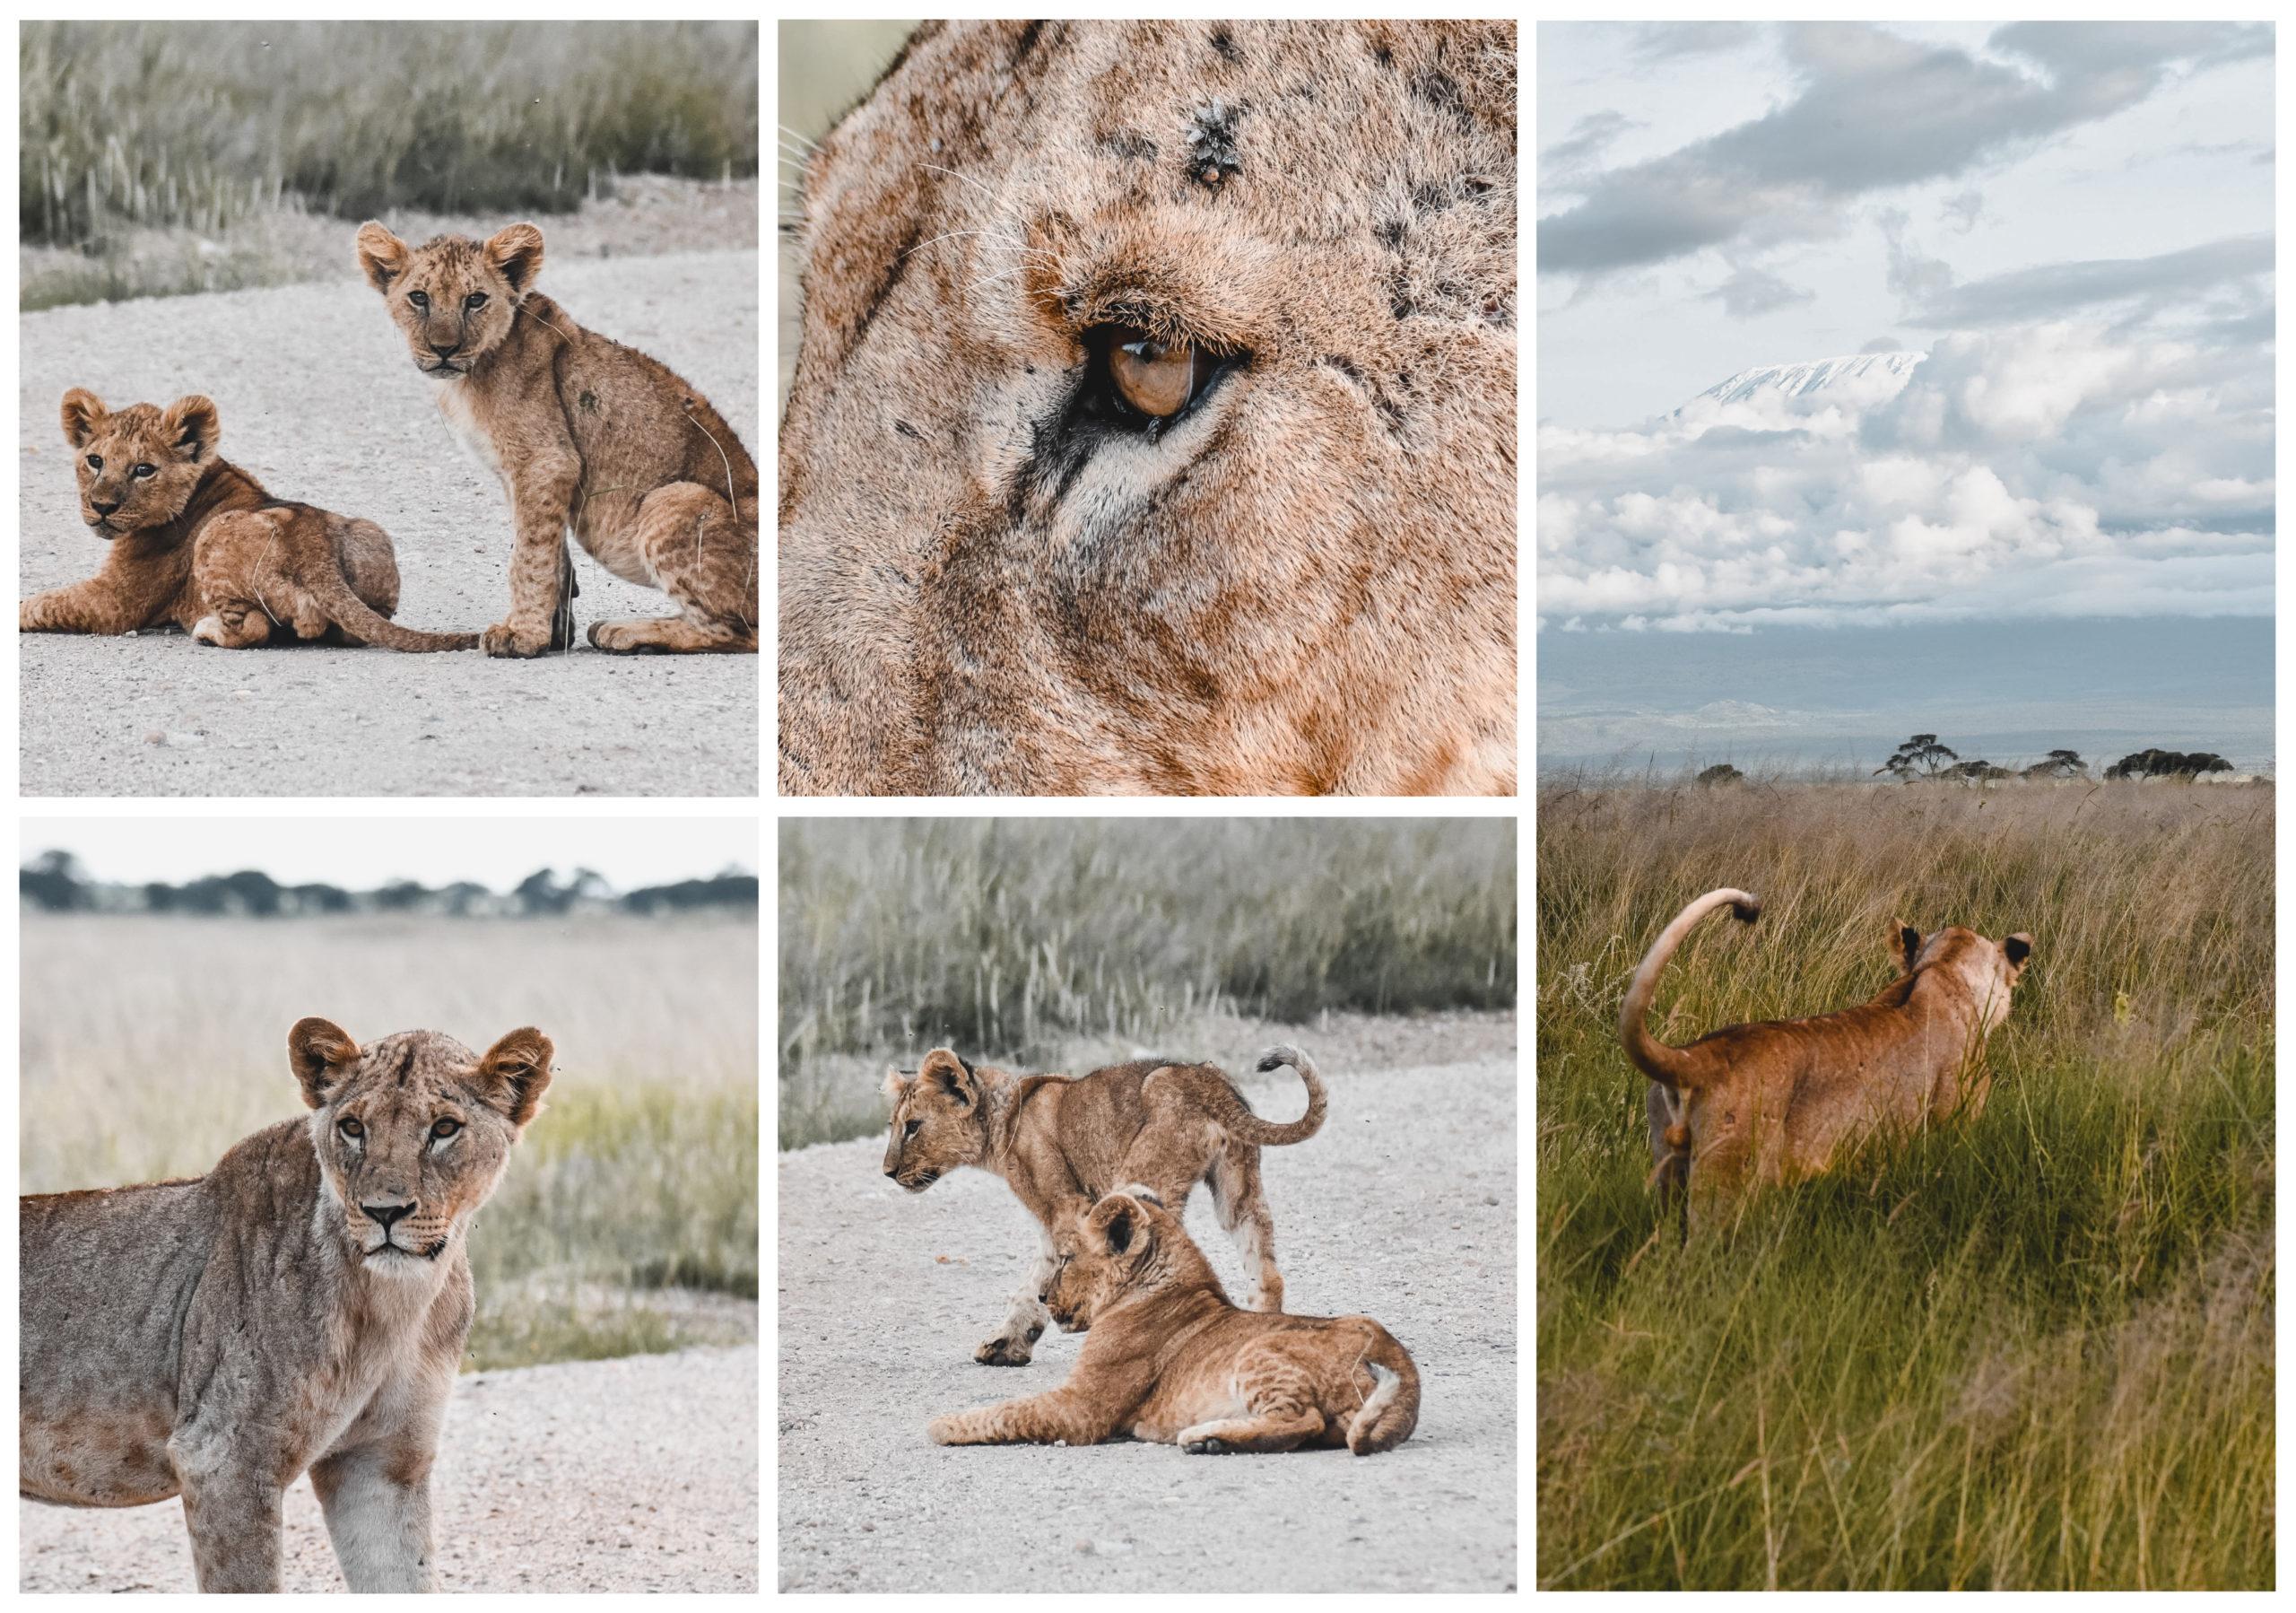 safari amboseli kenya lion